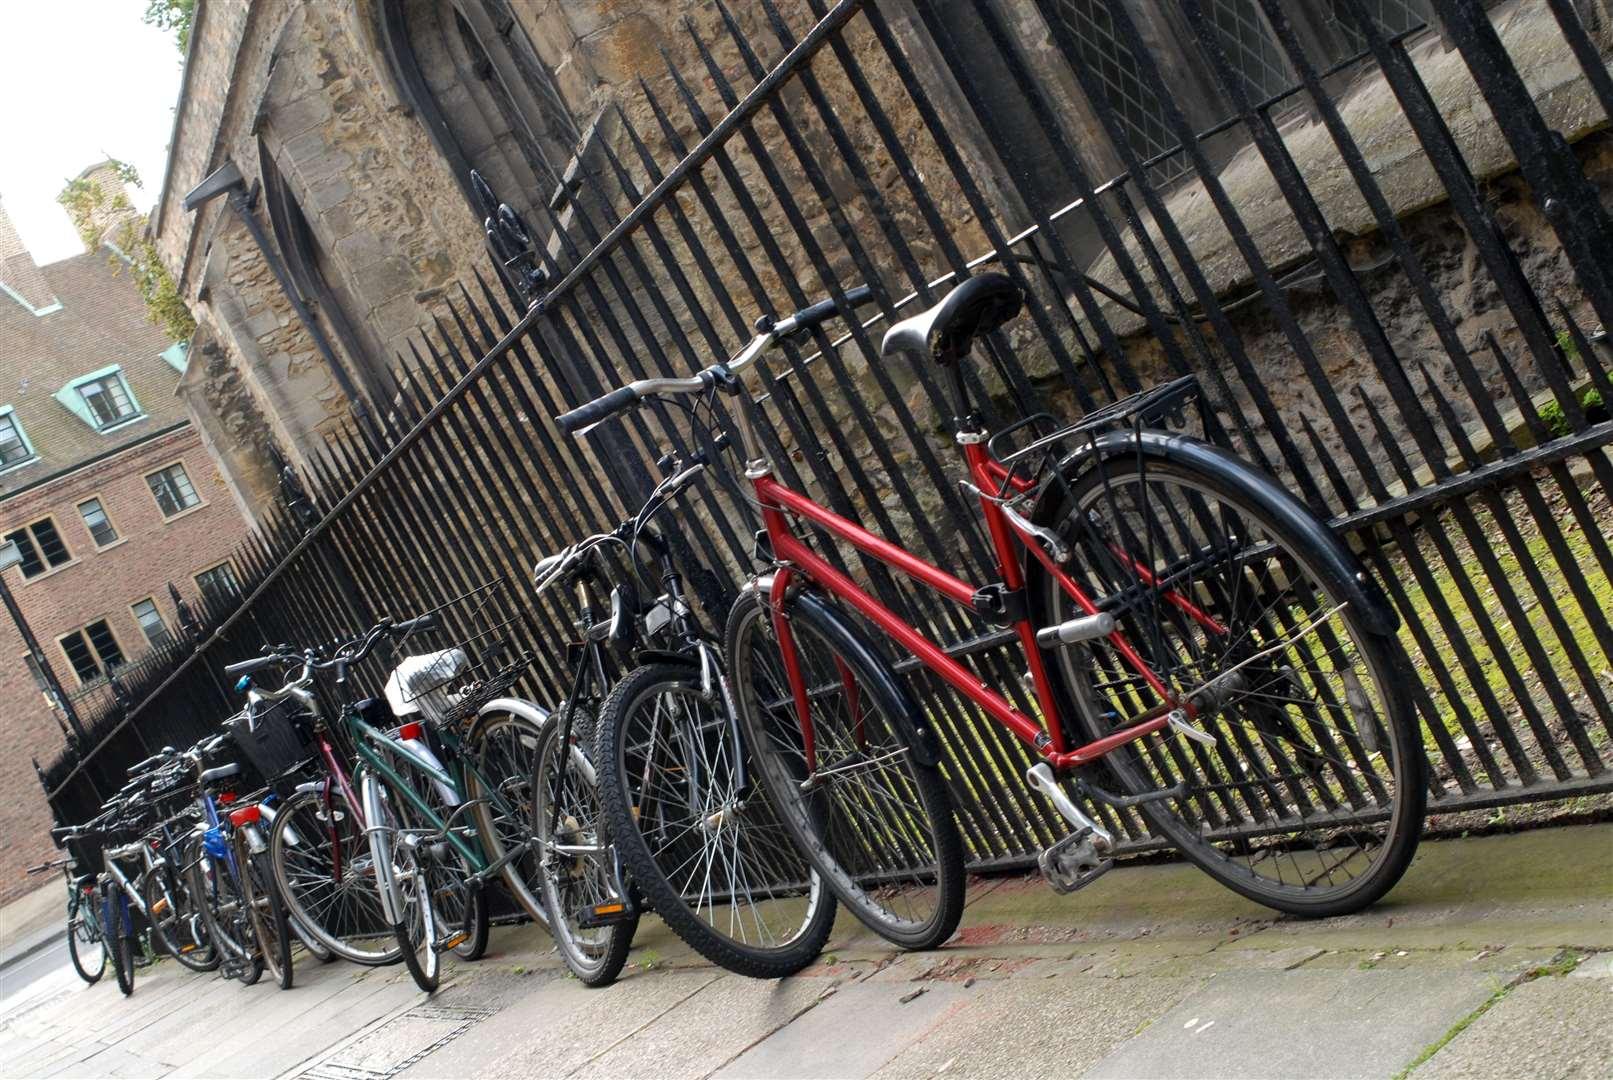 Bikes parked in Cambridge (41807131)